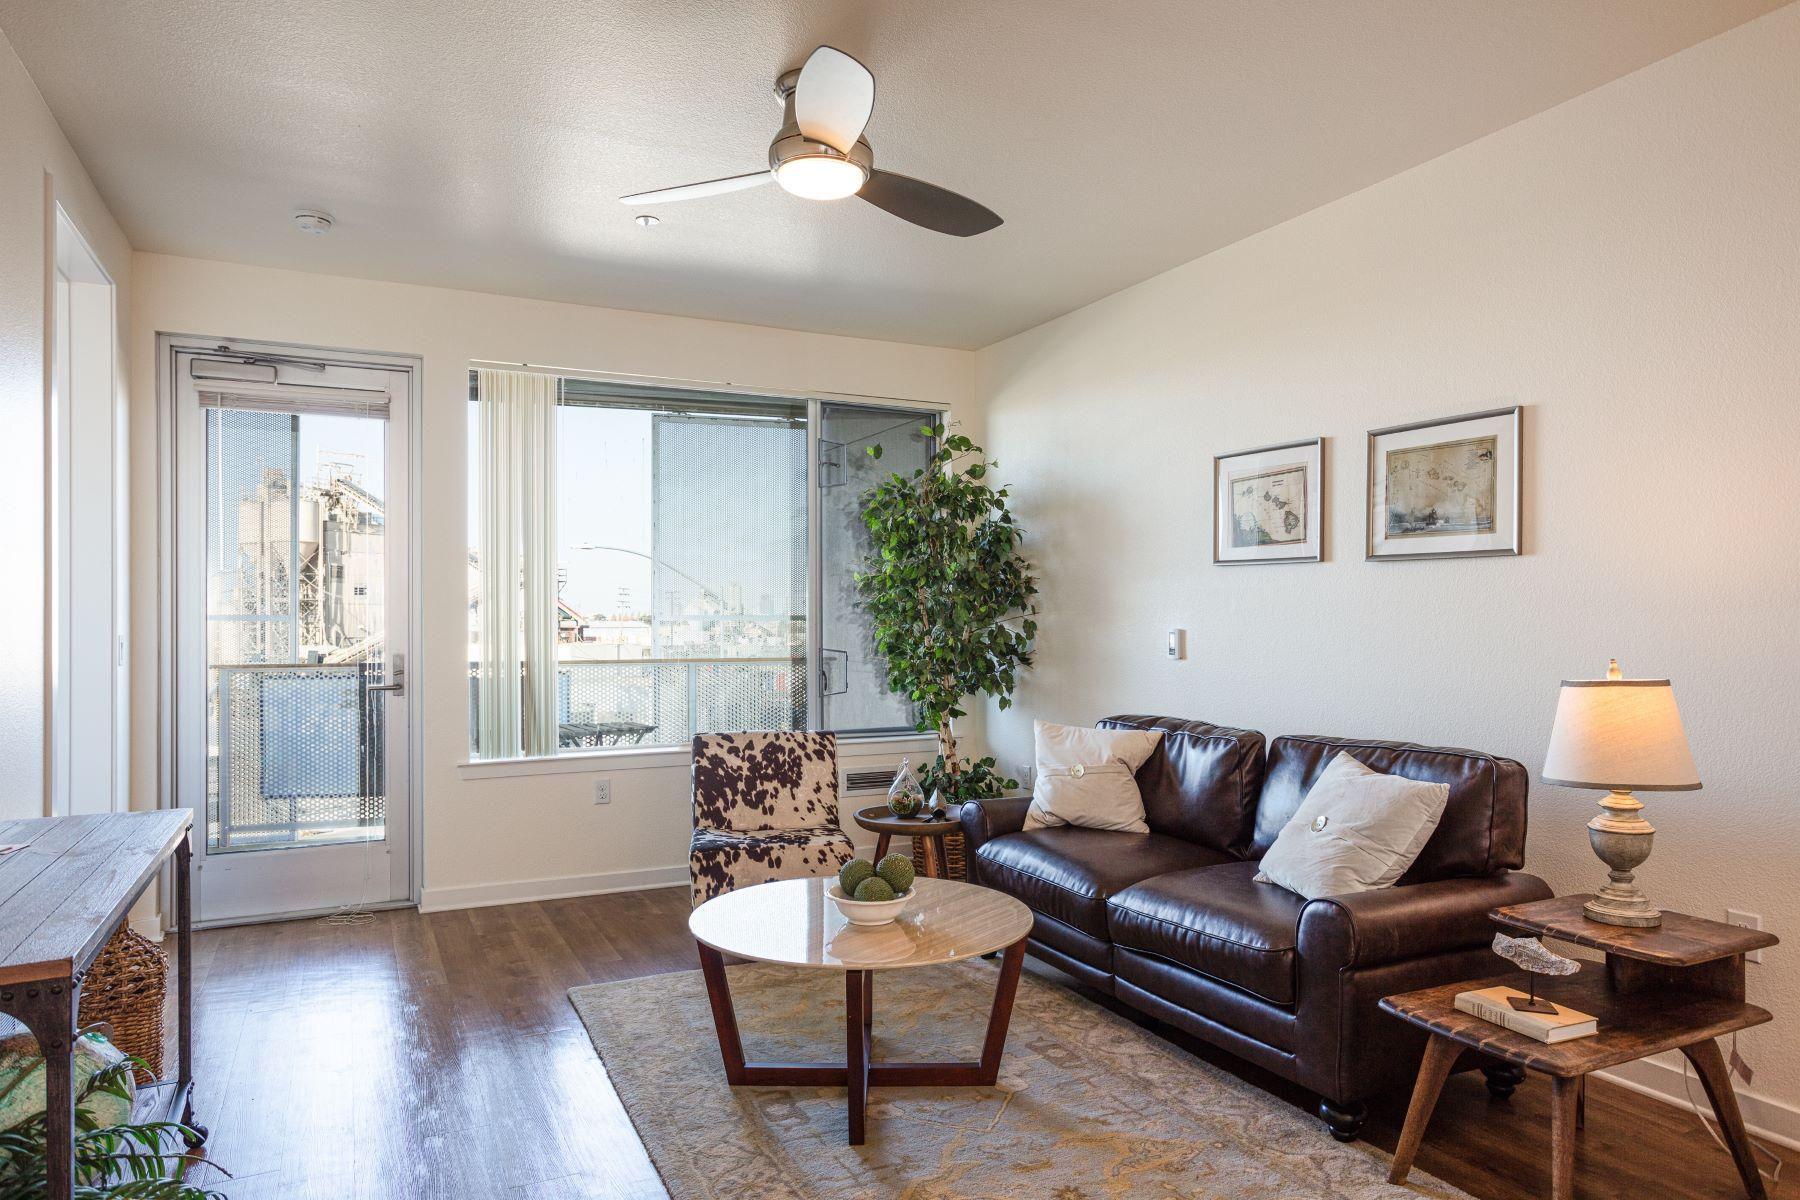 Condominiums for Sale at Phoenix Common's - Unique Plus Fifty-Five Housing Communithy 340 29th Avenue #308 Oakland, California 94601 United States